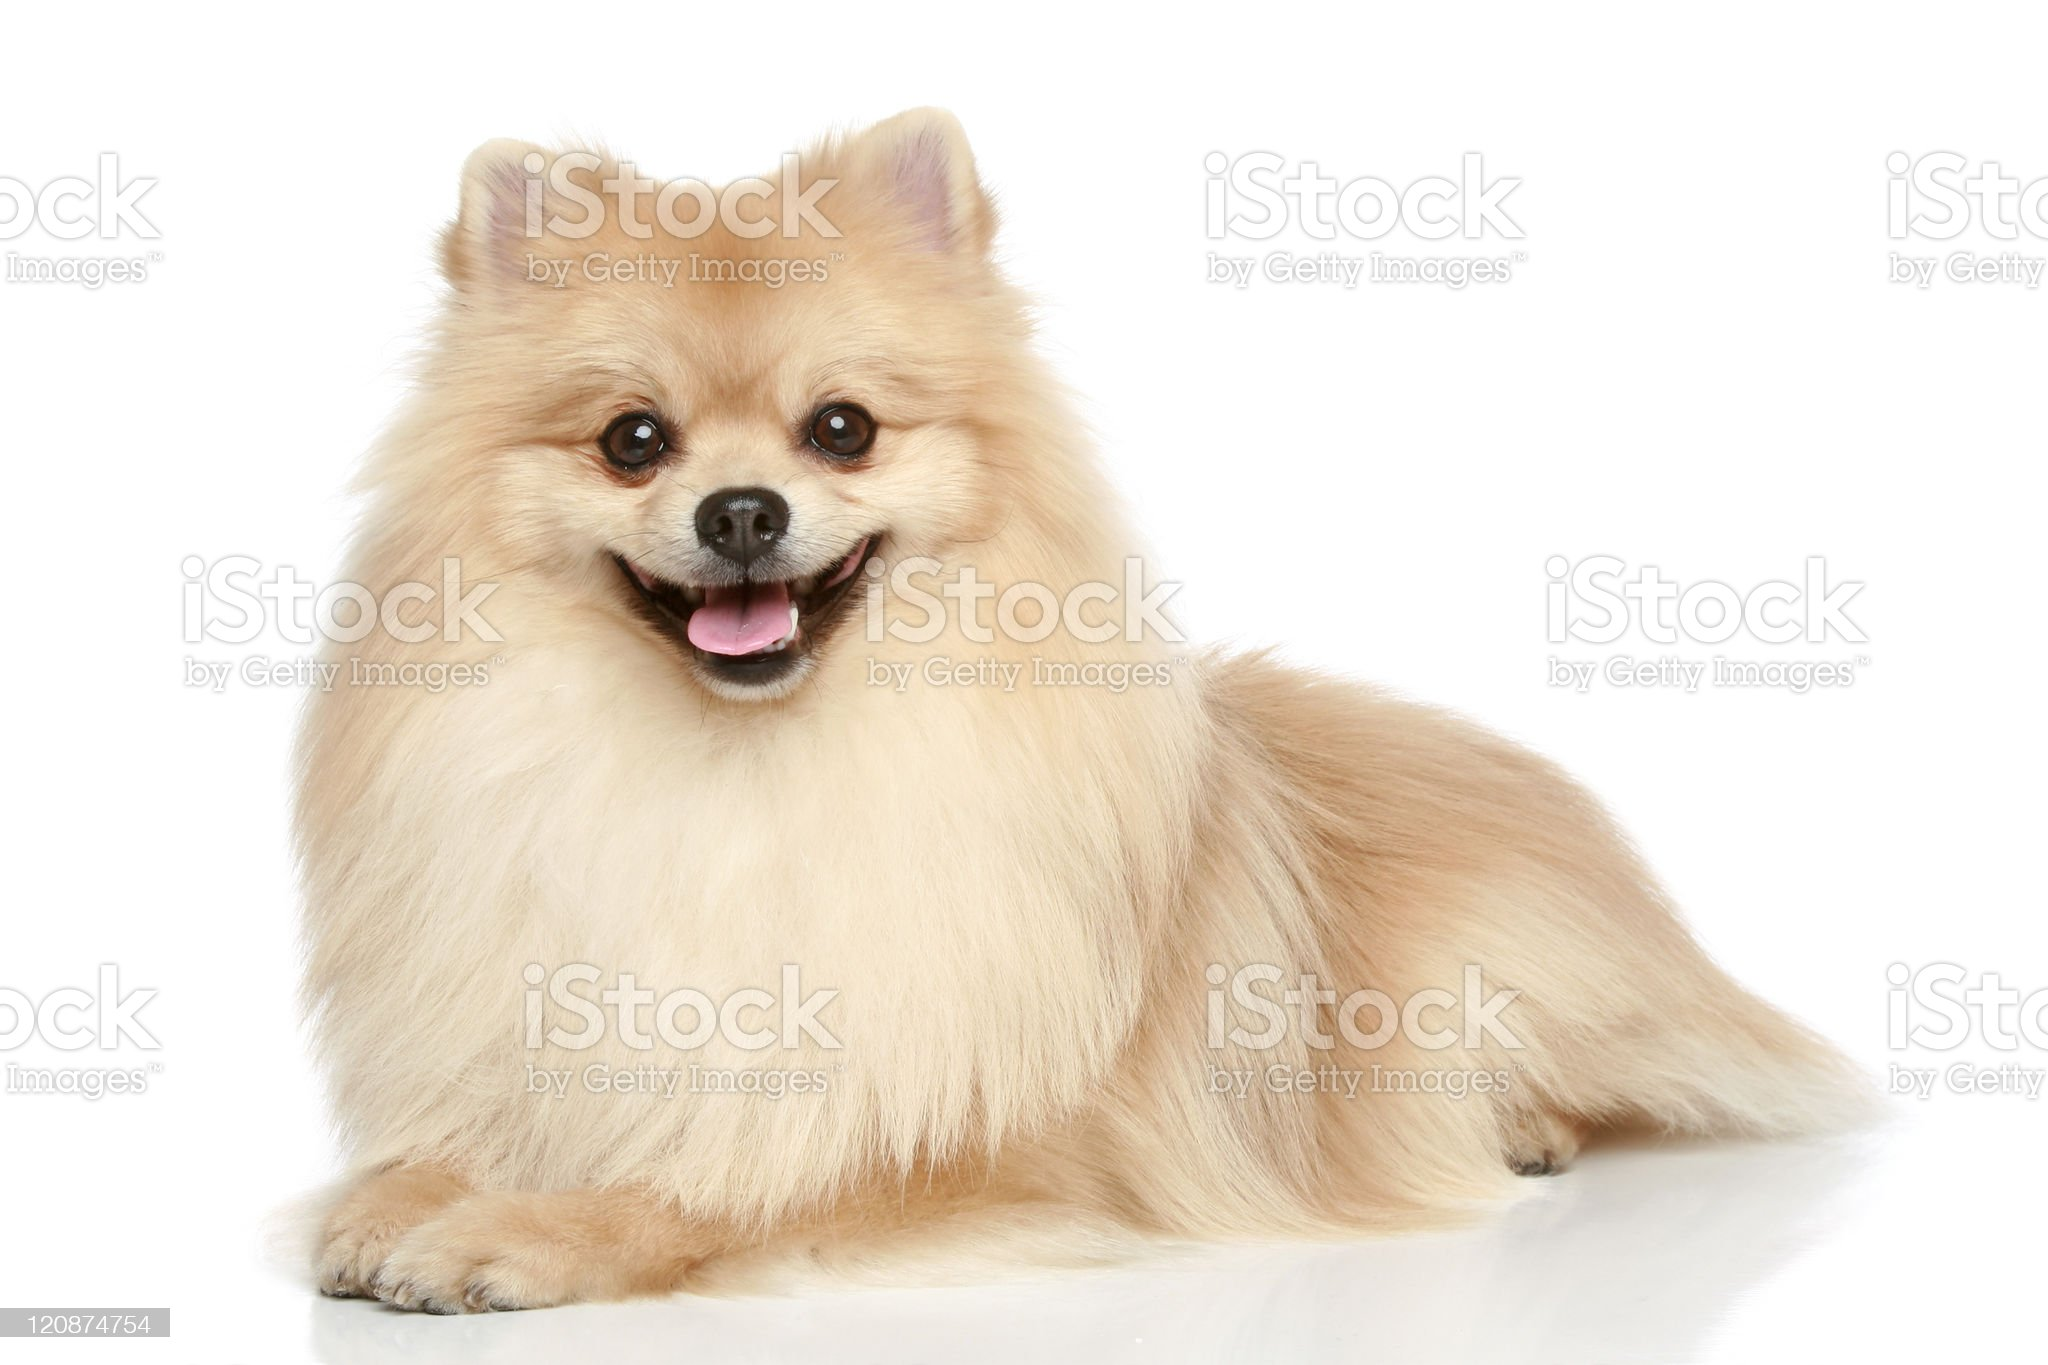 Pomeranian Spitz puppy on a white background royalty-free stock photo